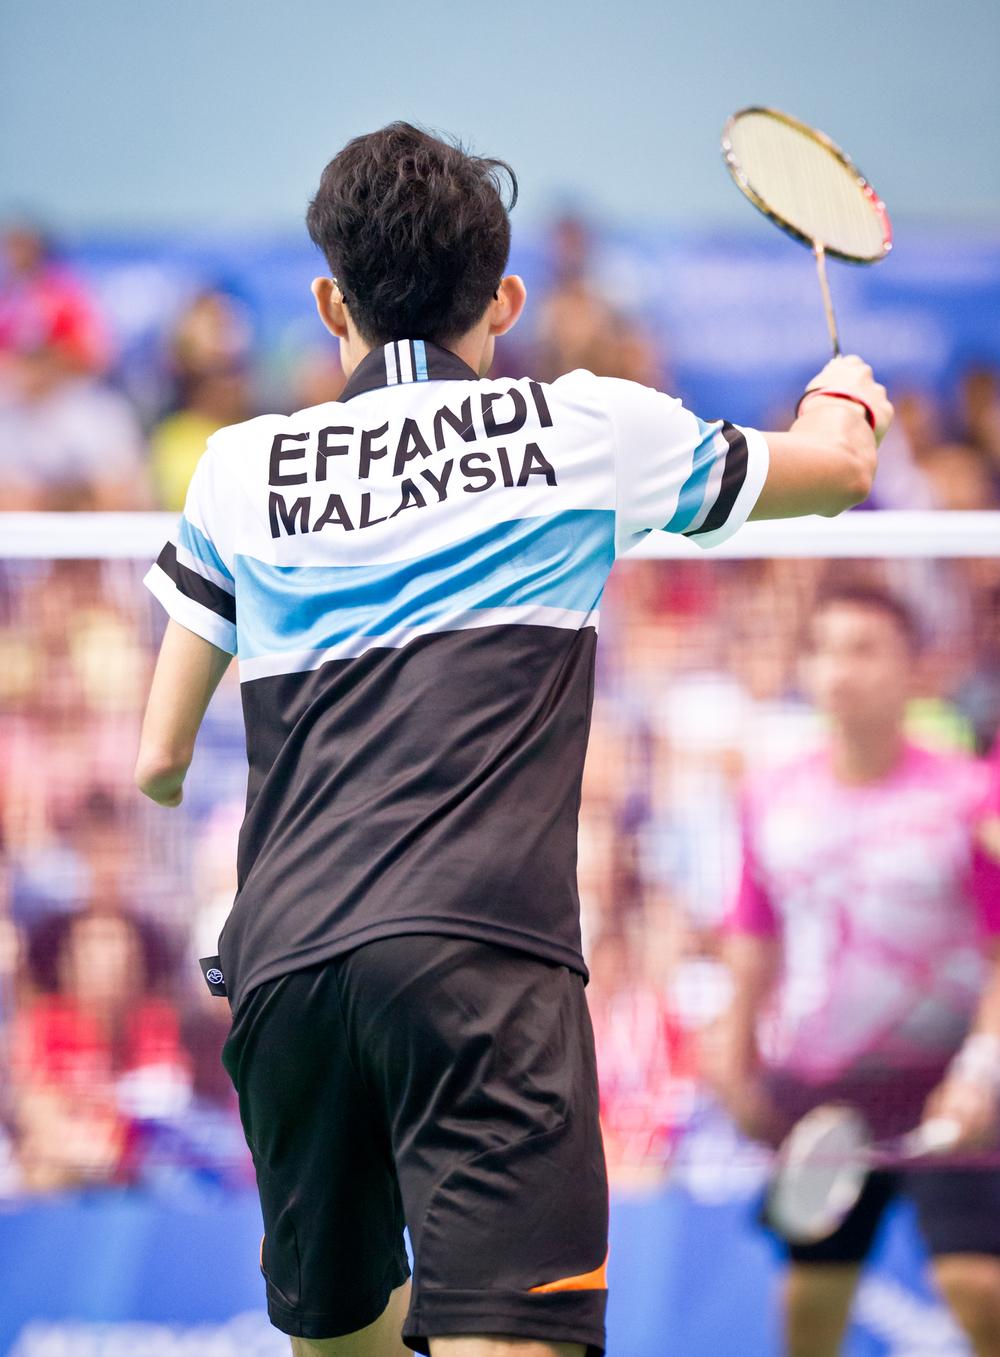 A Malaysian para-badminton player prepares to receive a serve during the ASEAN Para Games at the OCBC Arena.